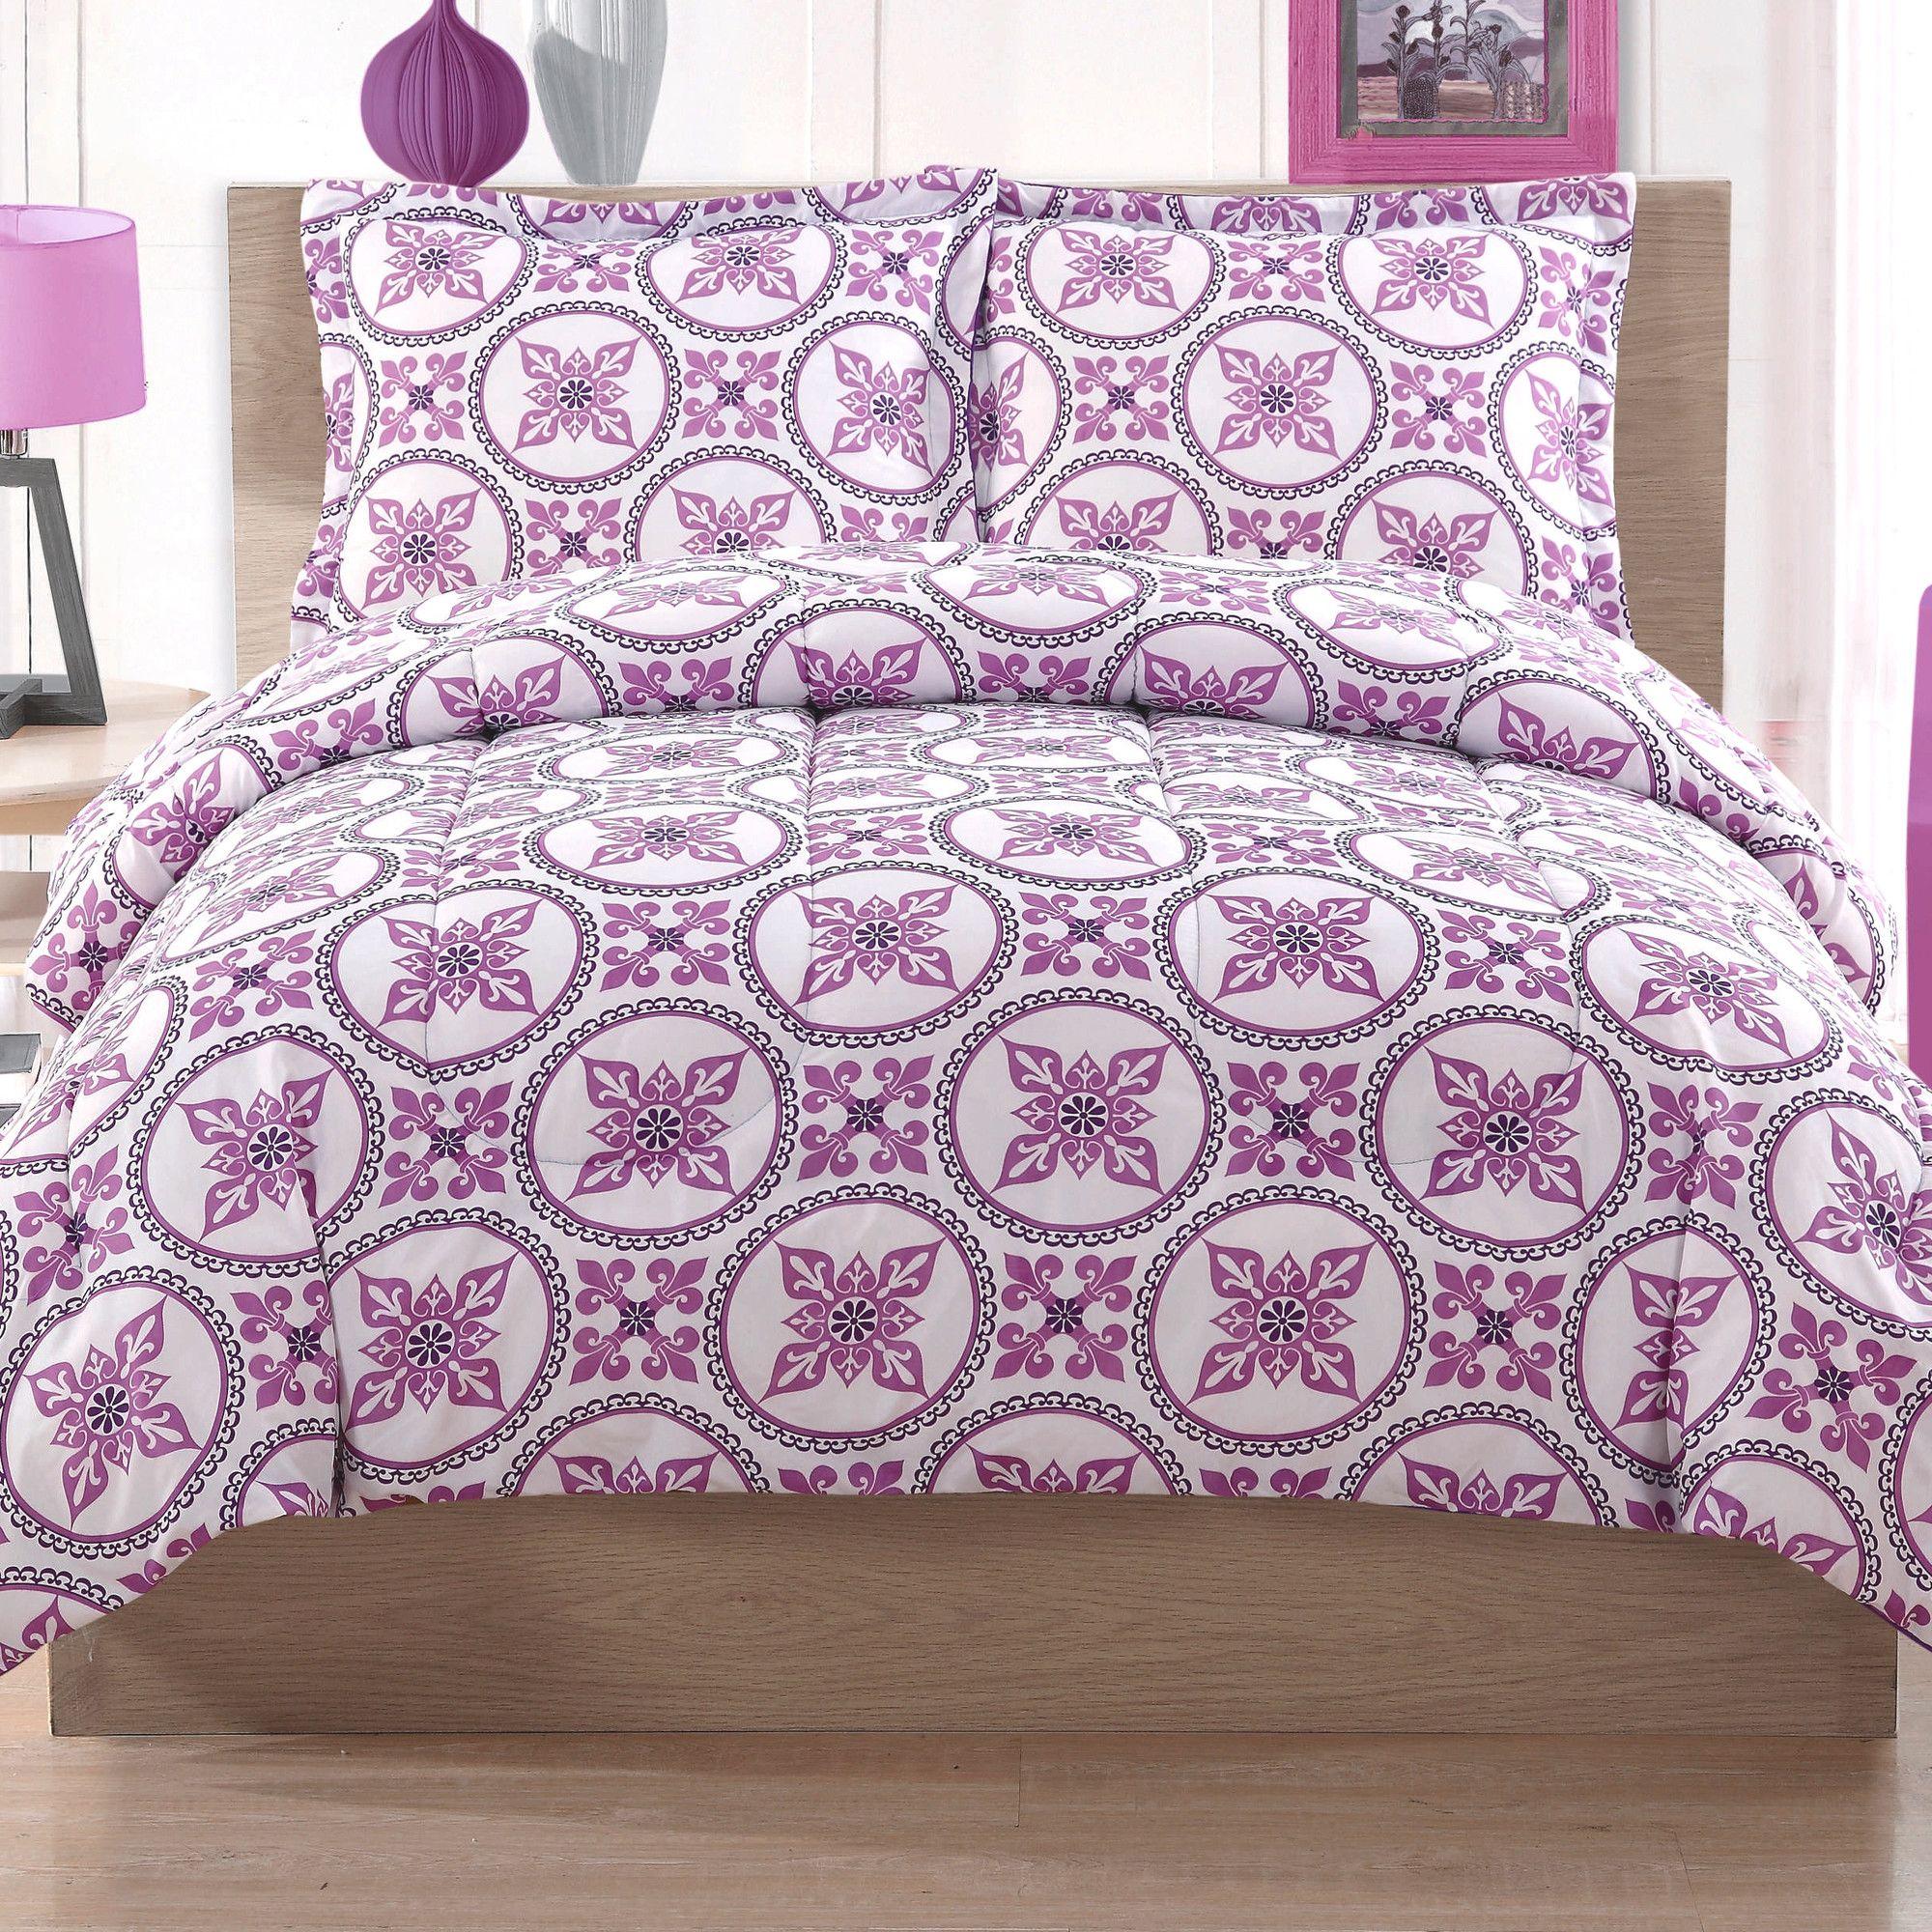 Lilac Bedroom Accessories Blue Teen Girl Bedding Sets: Cosmo Girl Baroque Circles Comforter Set